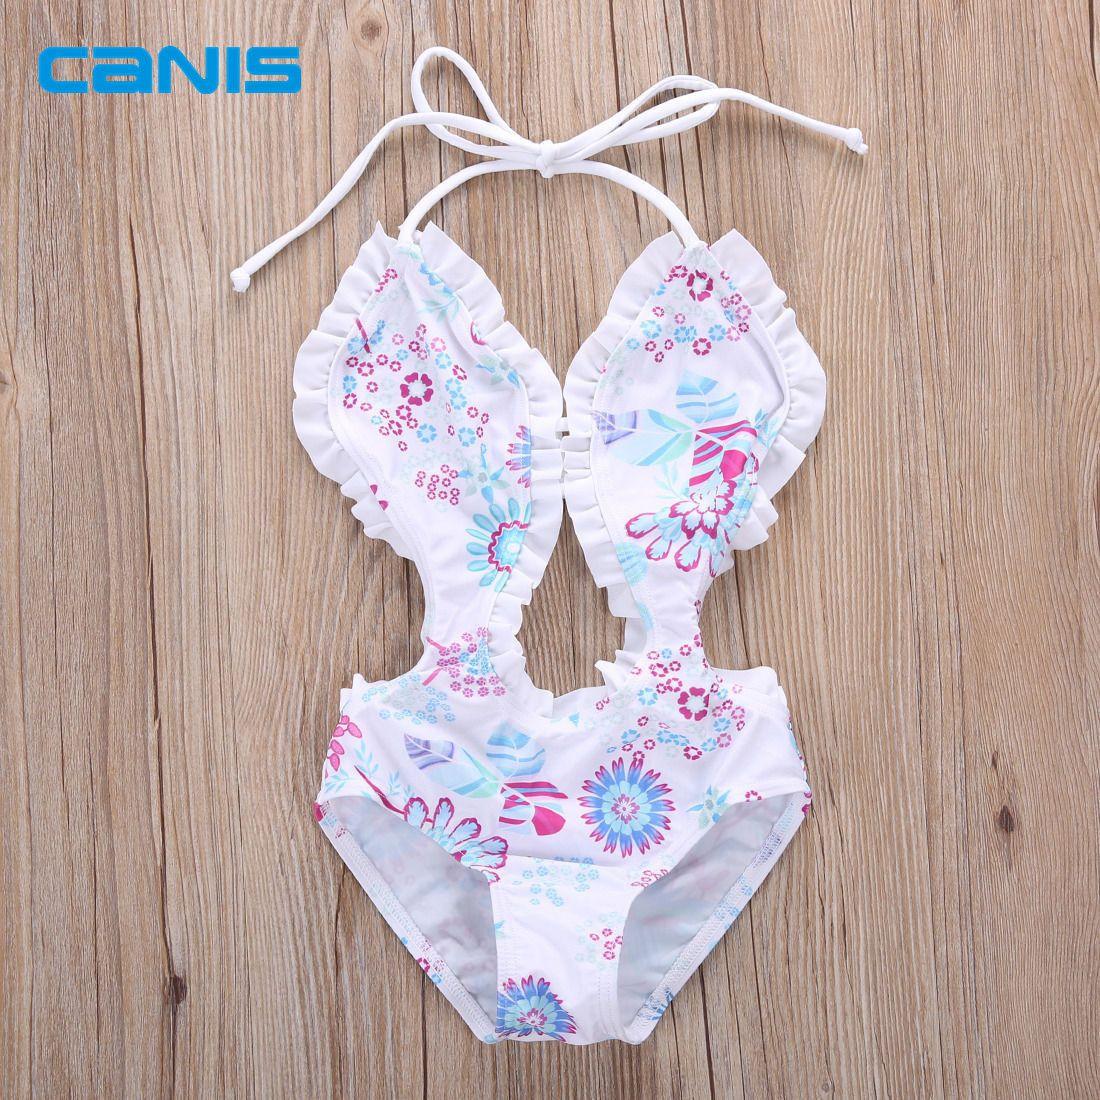 6687309d2 girls one piece swimwear bikini children's swimwear girls bathing suits  baby Floral swimming suit girl swimwear beachwear #Affiliate